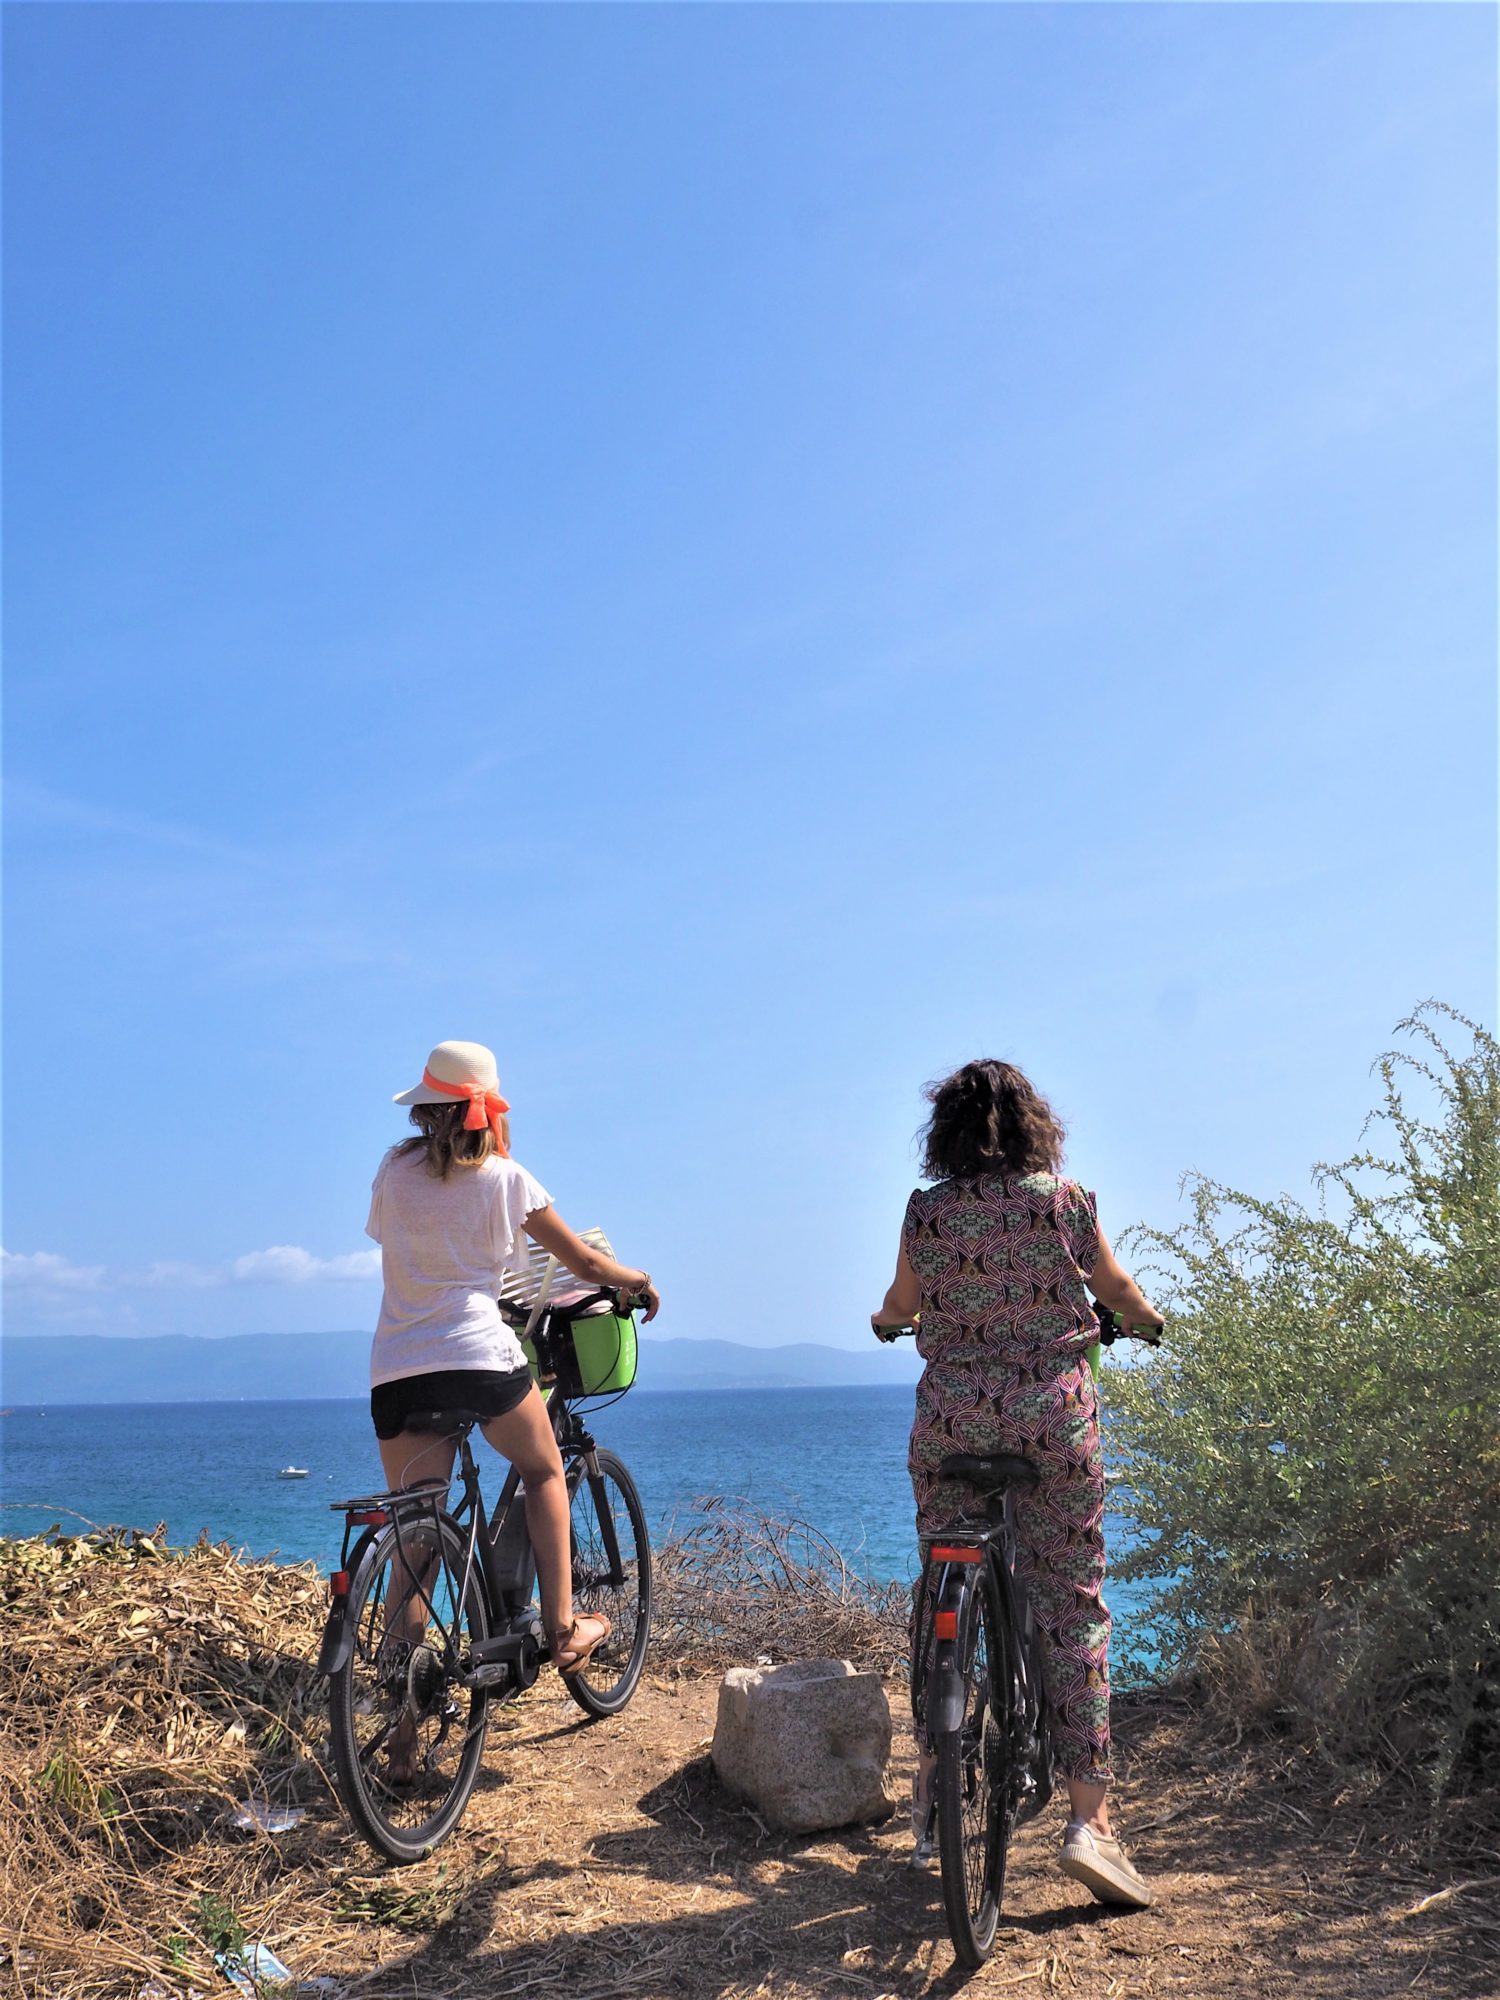 Corse, Ajaccio; On admire la mer avec nos vélos AppeBike